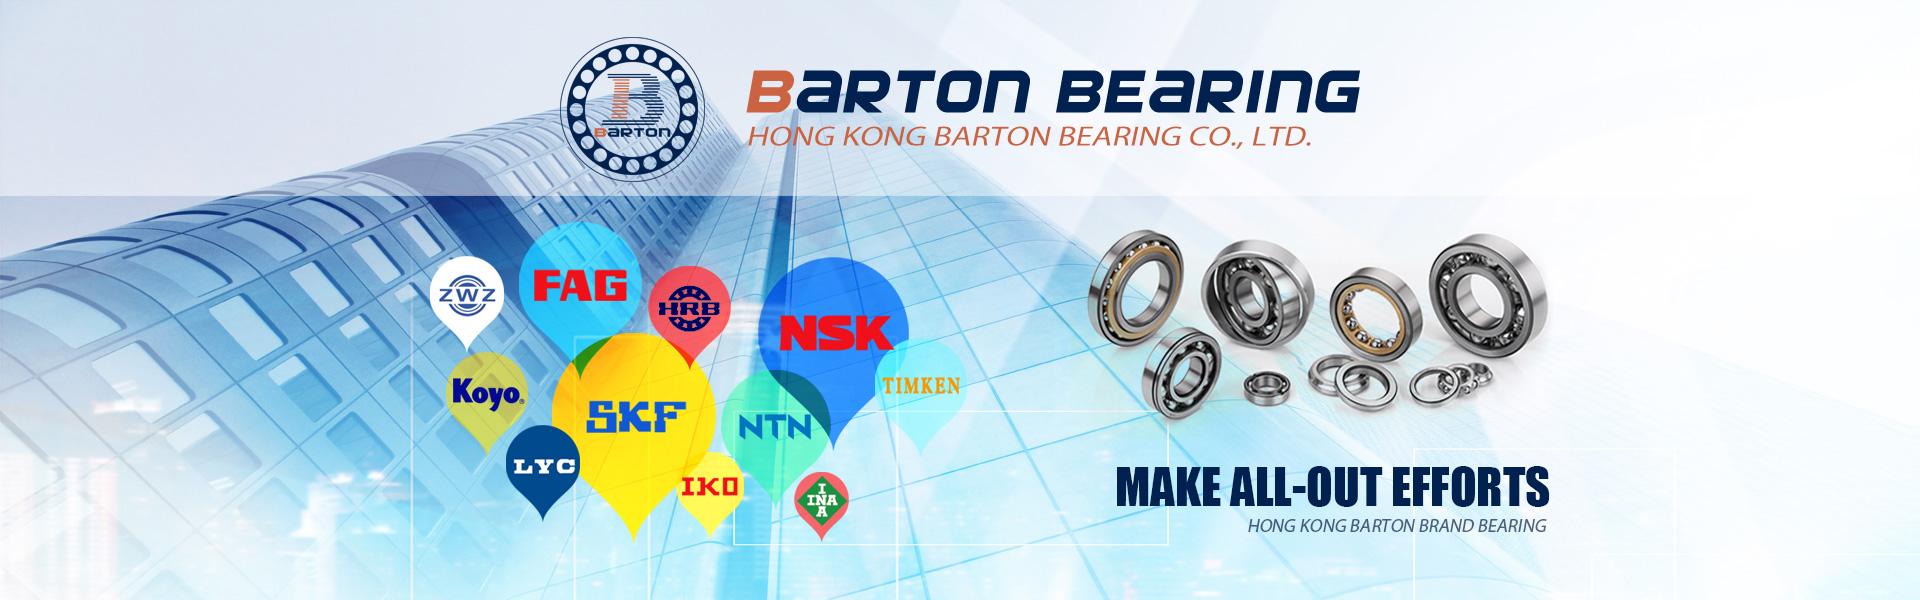 Barton Bearing